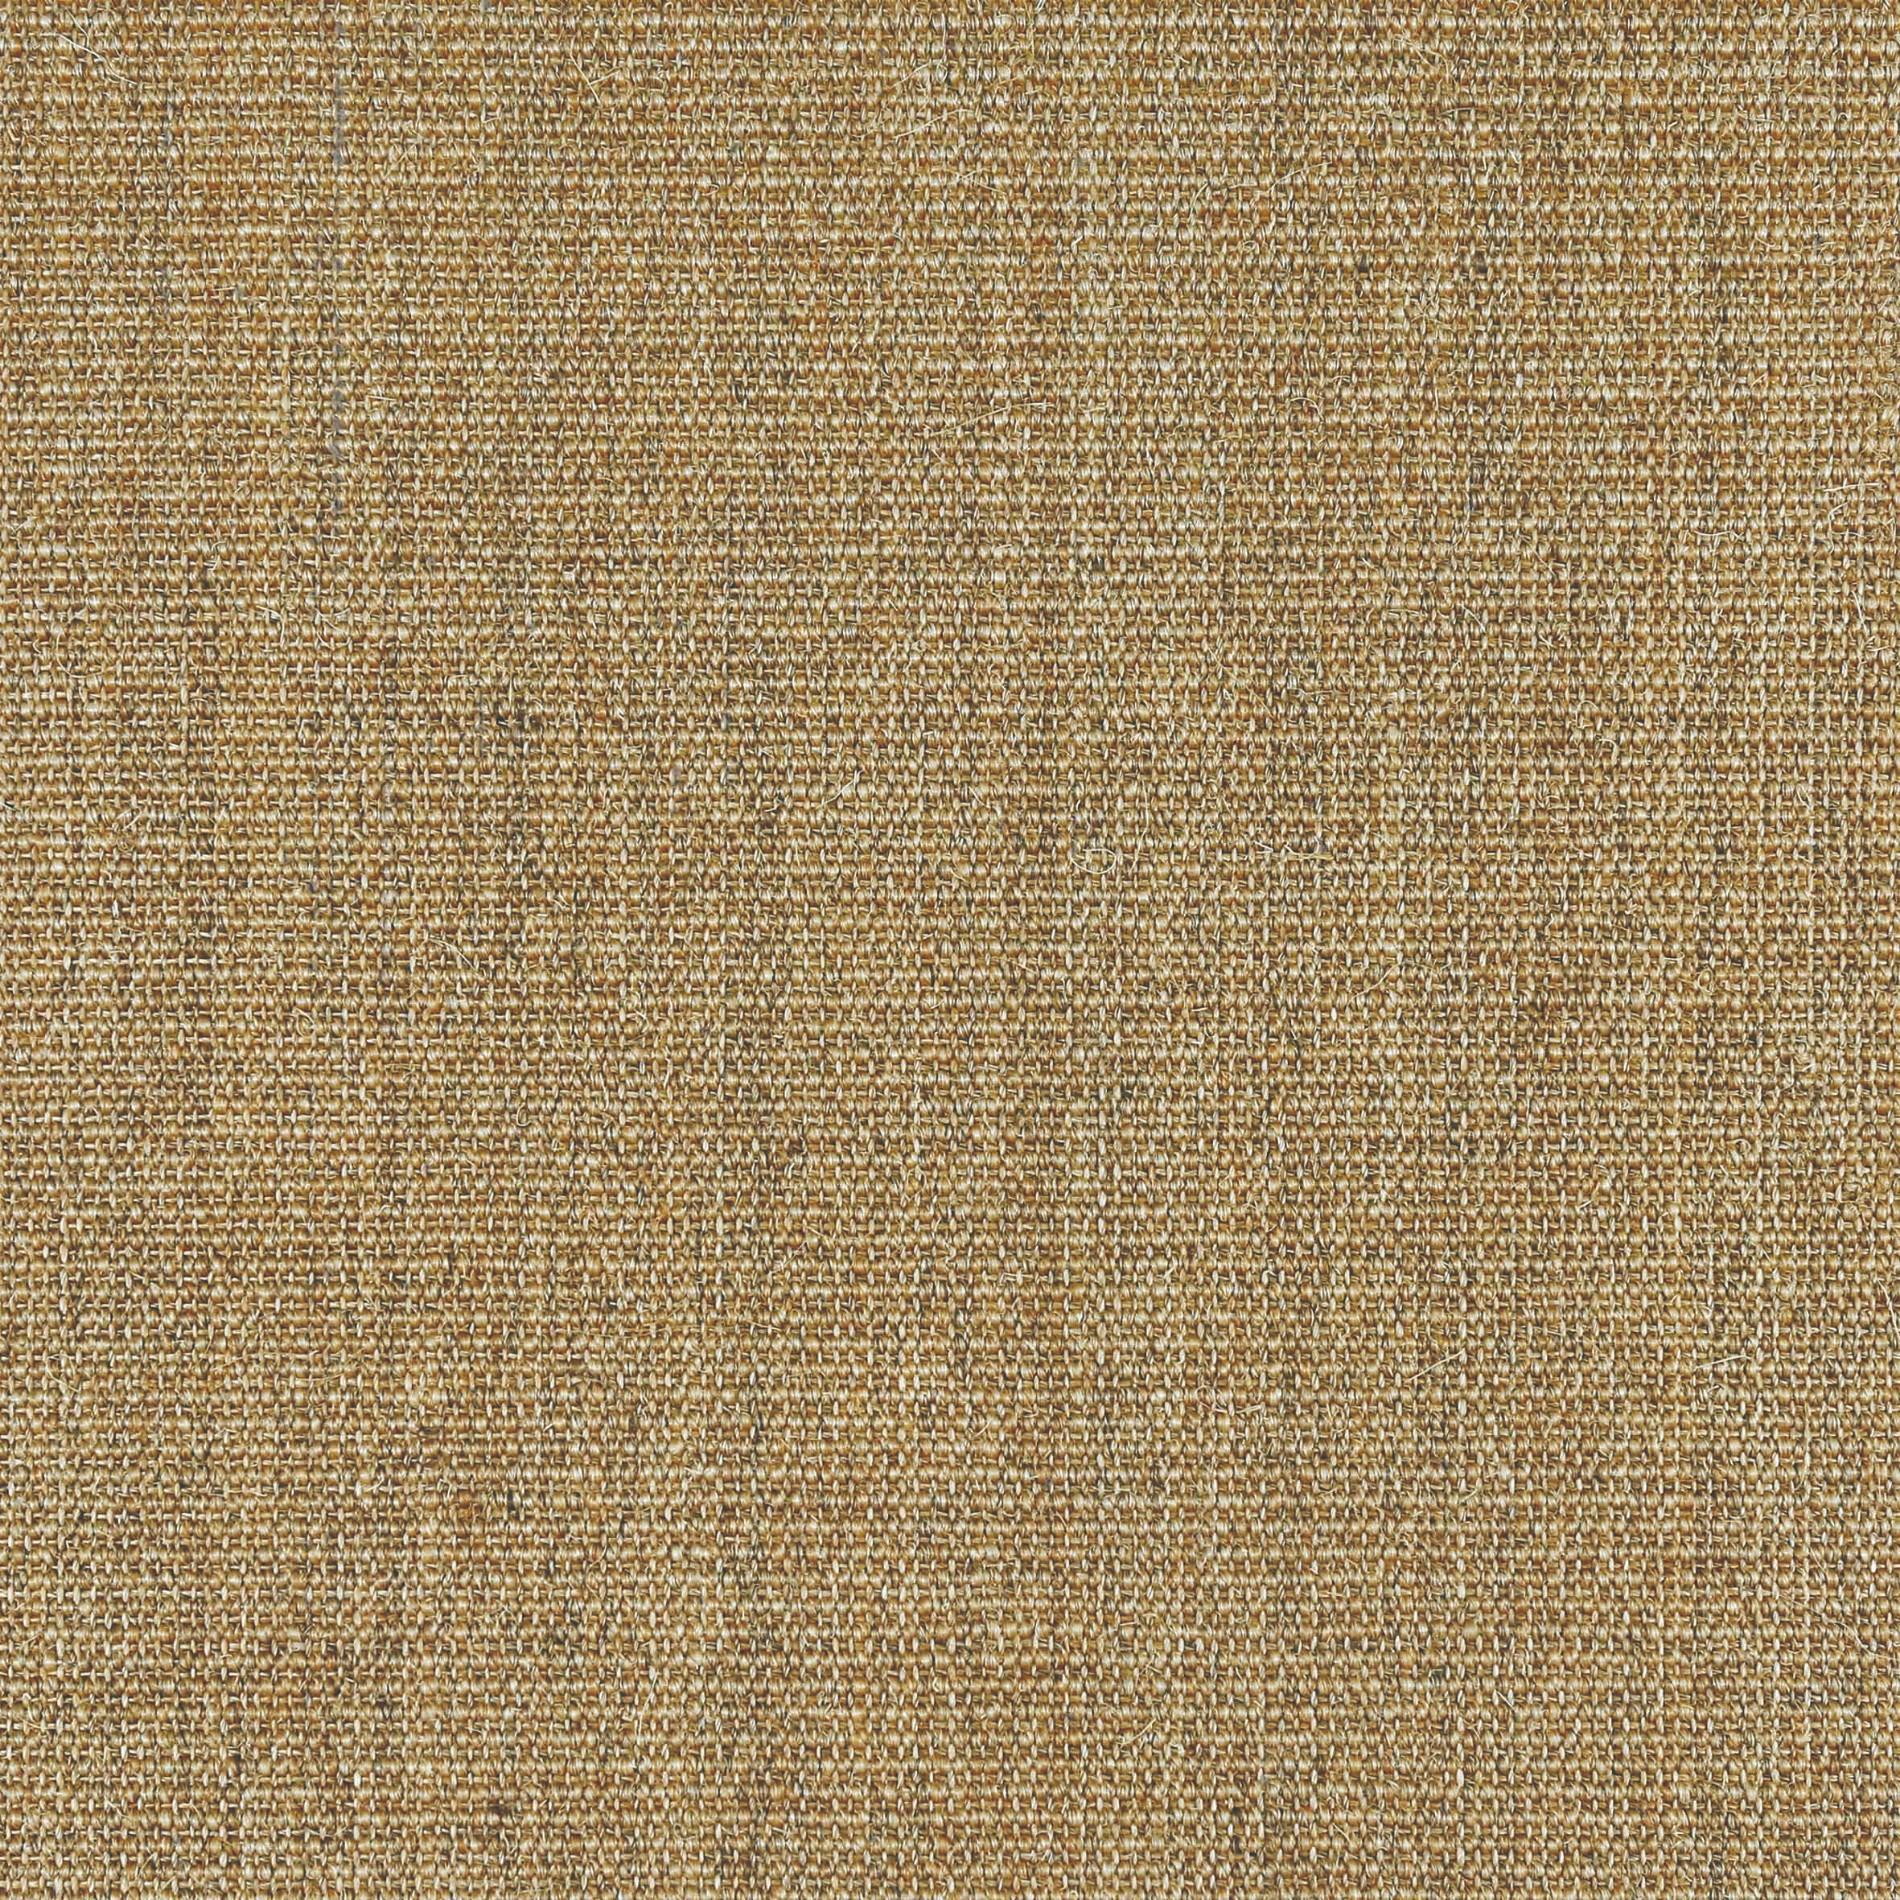 Sisal PVC Carpet Squares Manufacturers, Sisal PVC Carpet Squares Factory, Supply Sisal PVC Carpet Squares